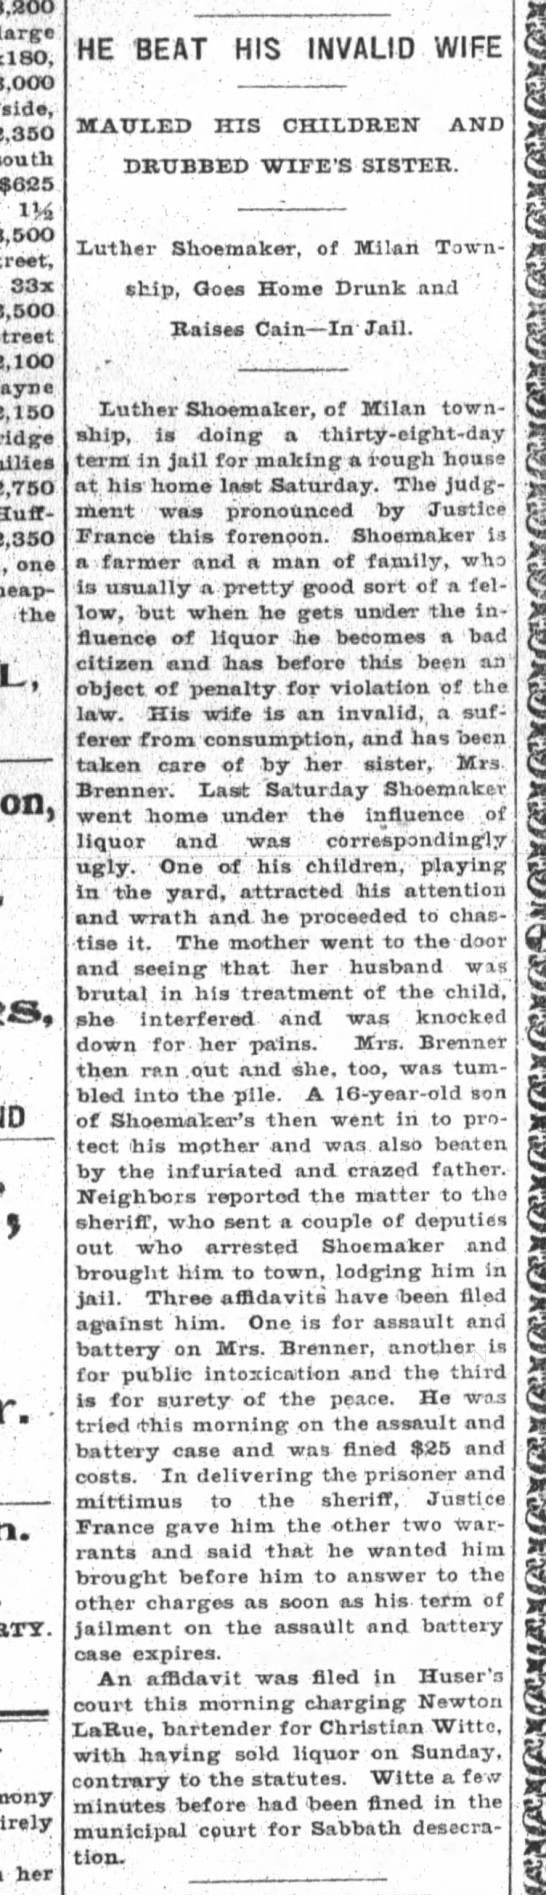 The Fort Wayne Sentinel, Ft. Wayne, IN 11 Nov 1901